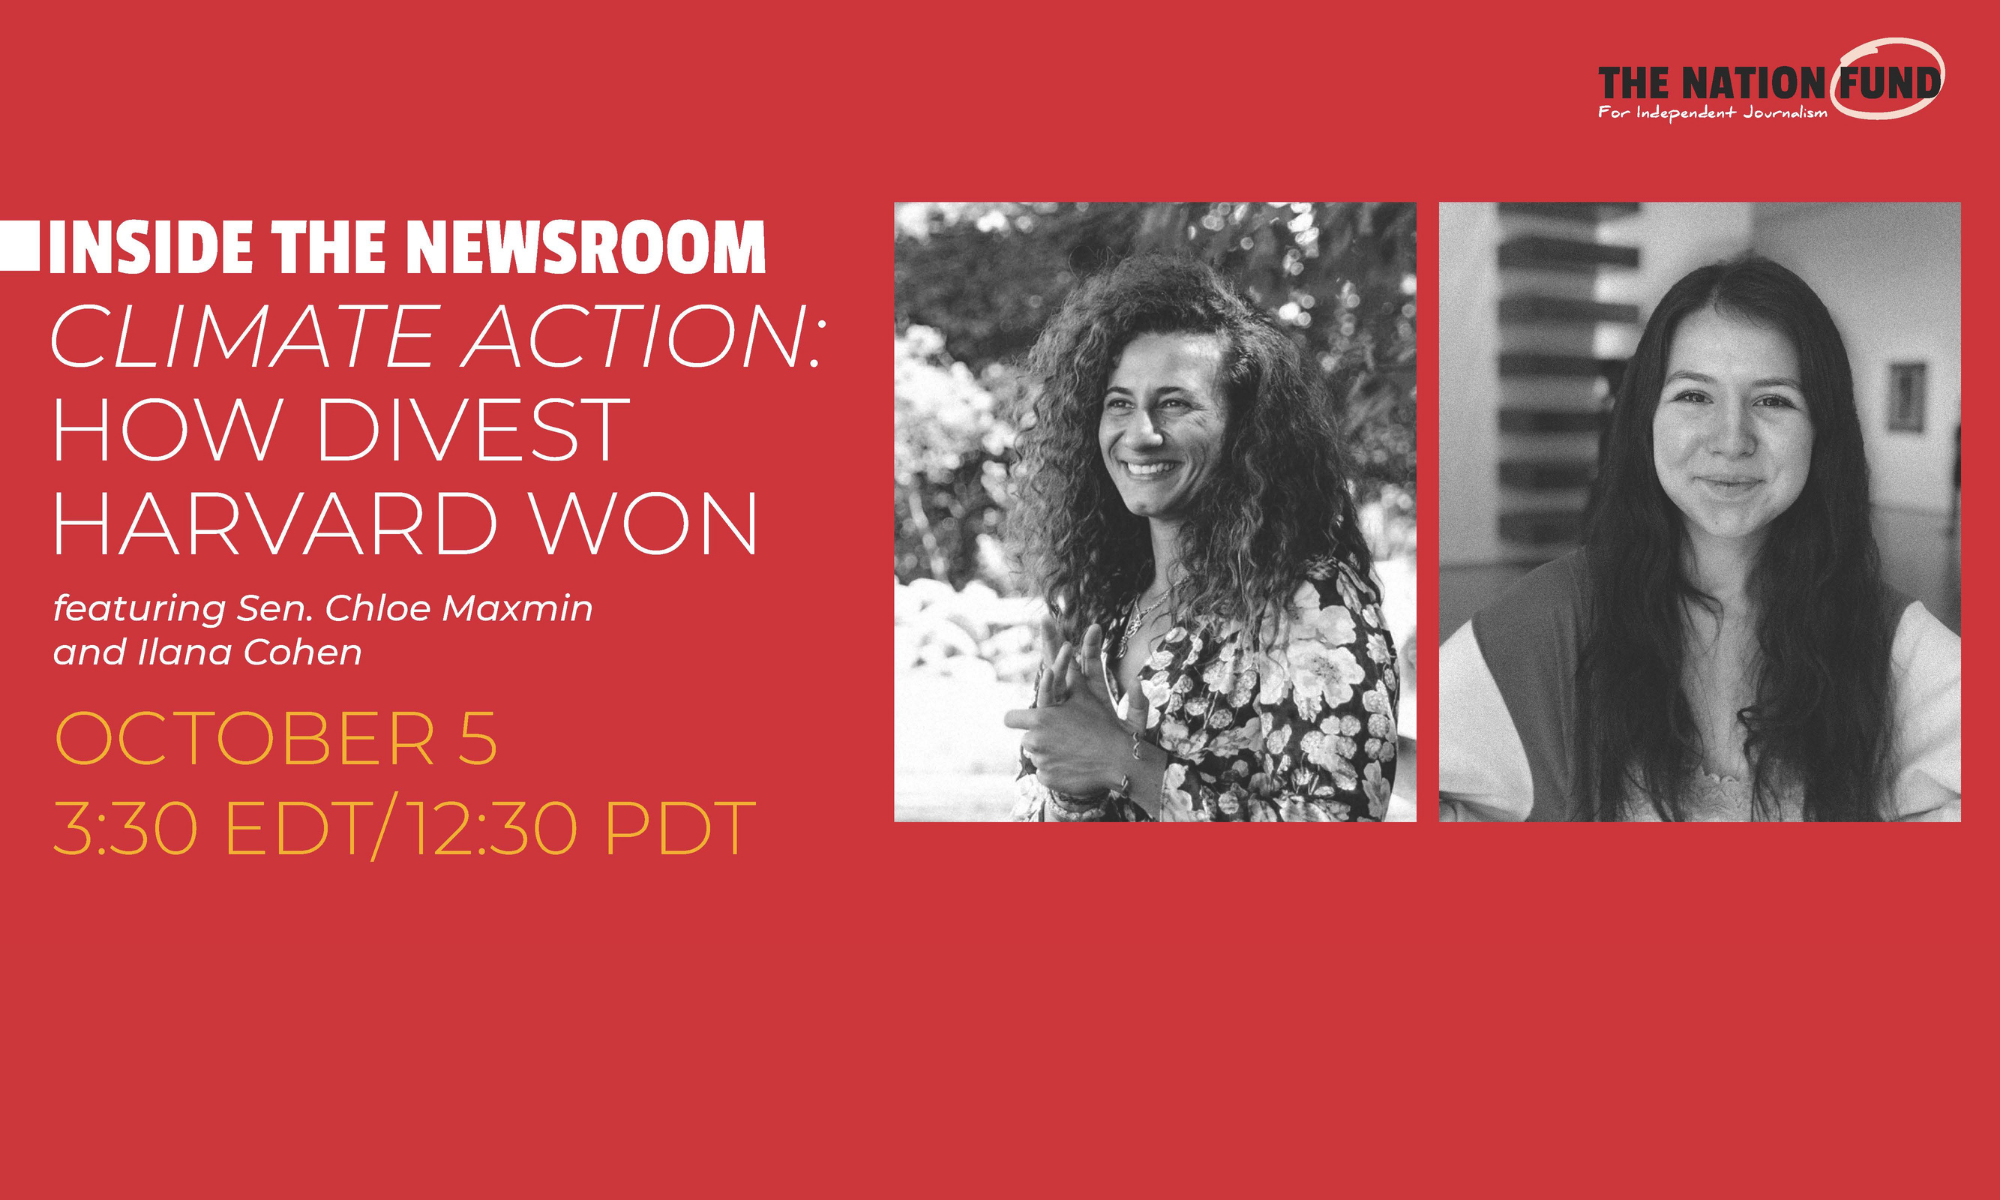 VIDEO: Inside the Newsroom – How Divest Harvard Won